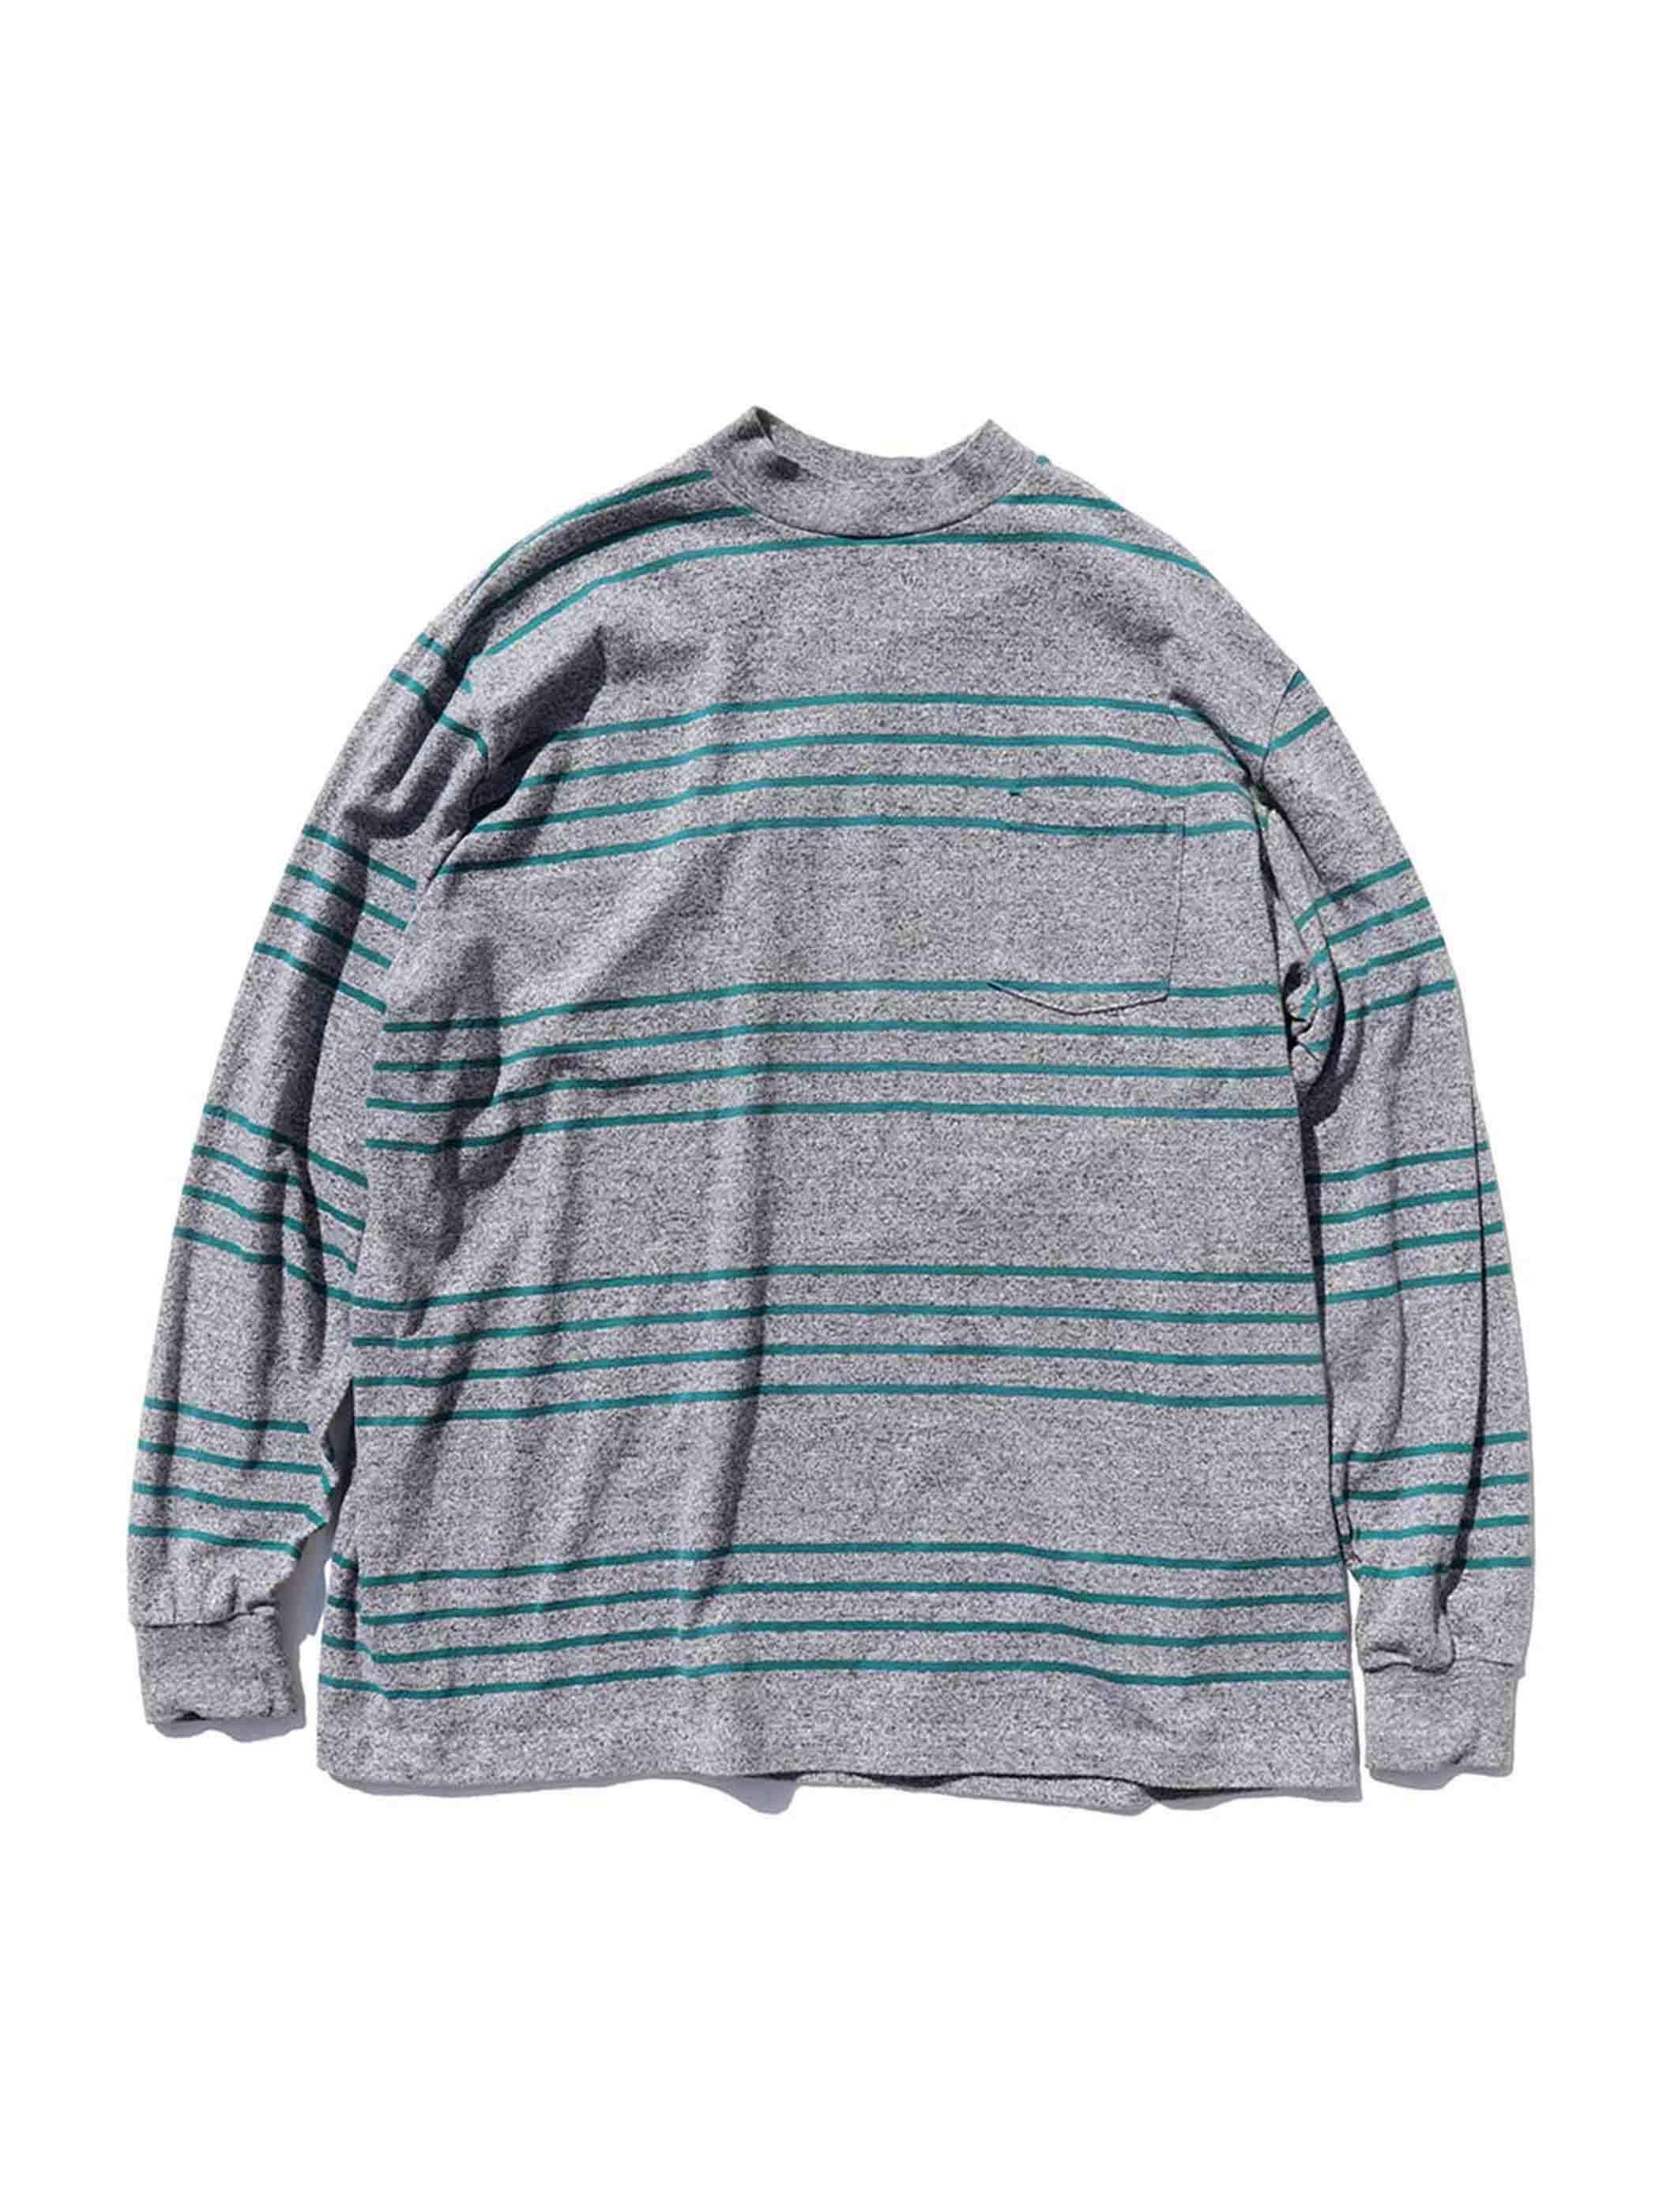 80's OAKTON LIMITED Stripe L/S Pocket T-Shirt Made In U.S.A. [4XL]